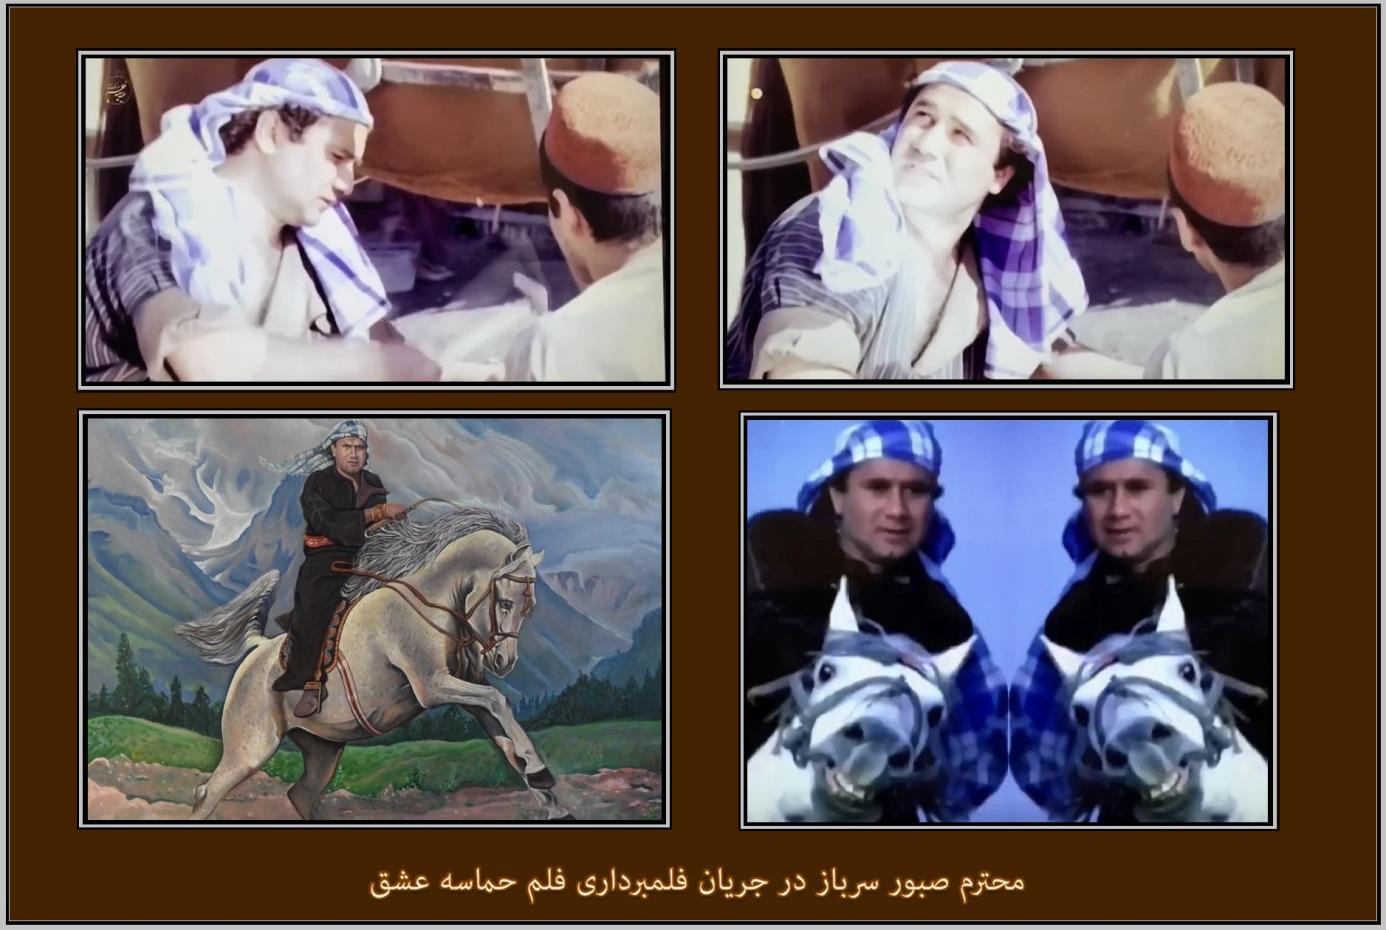 C:\Users\Masoud_2\Desktop\عکسهای صبور سرباز\sabur-10.jpg